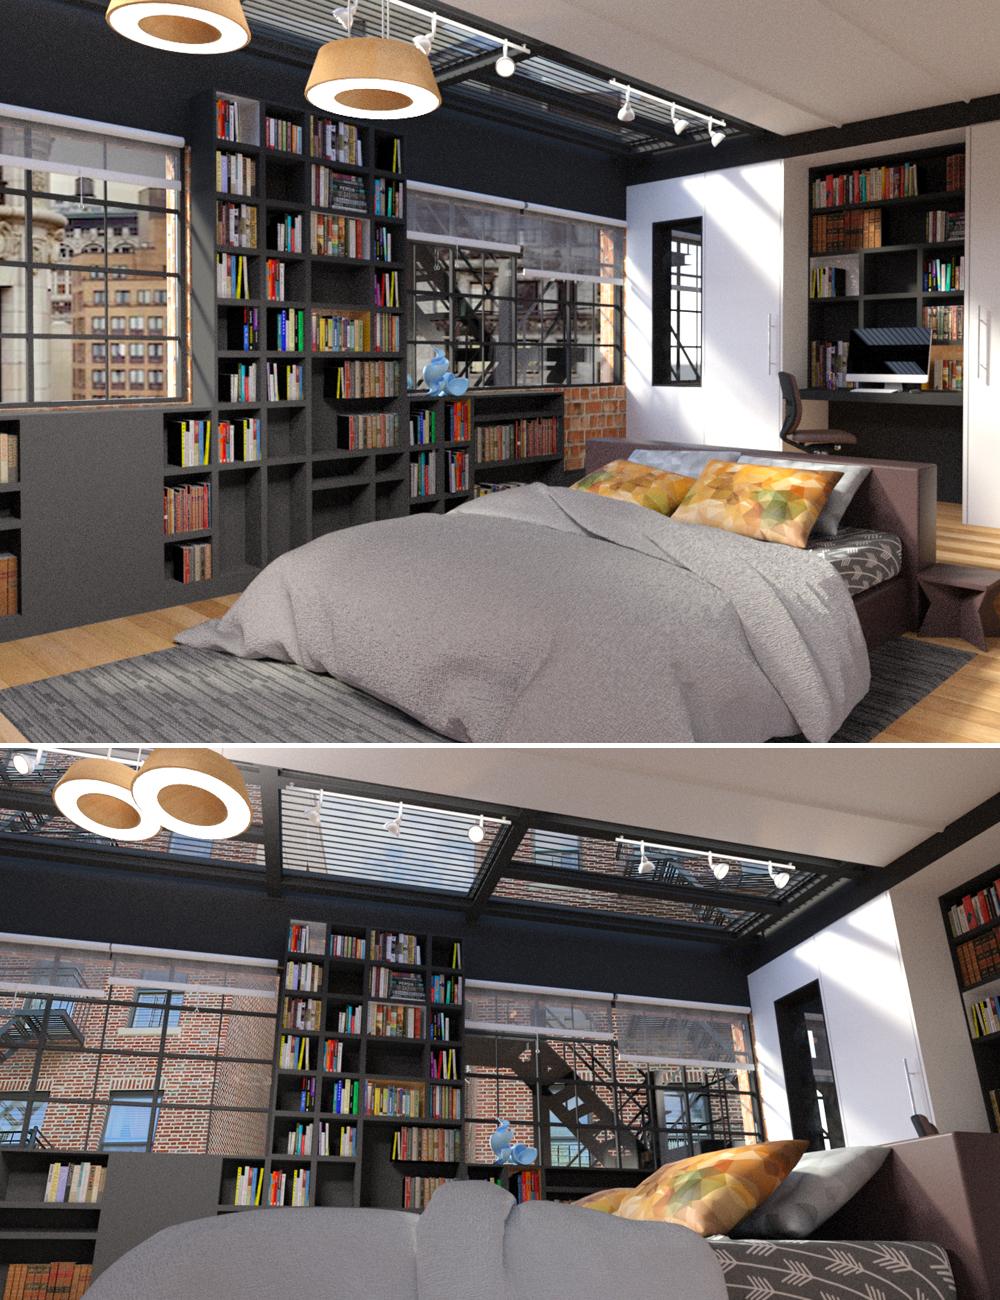 Brooklyn Apartment by: Digitallab3D, 3D Models by Daz 3D